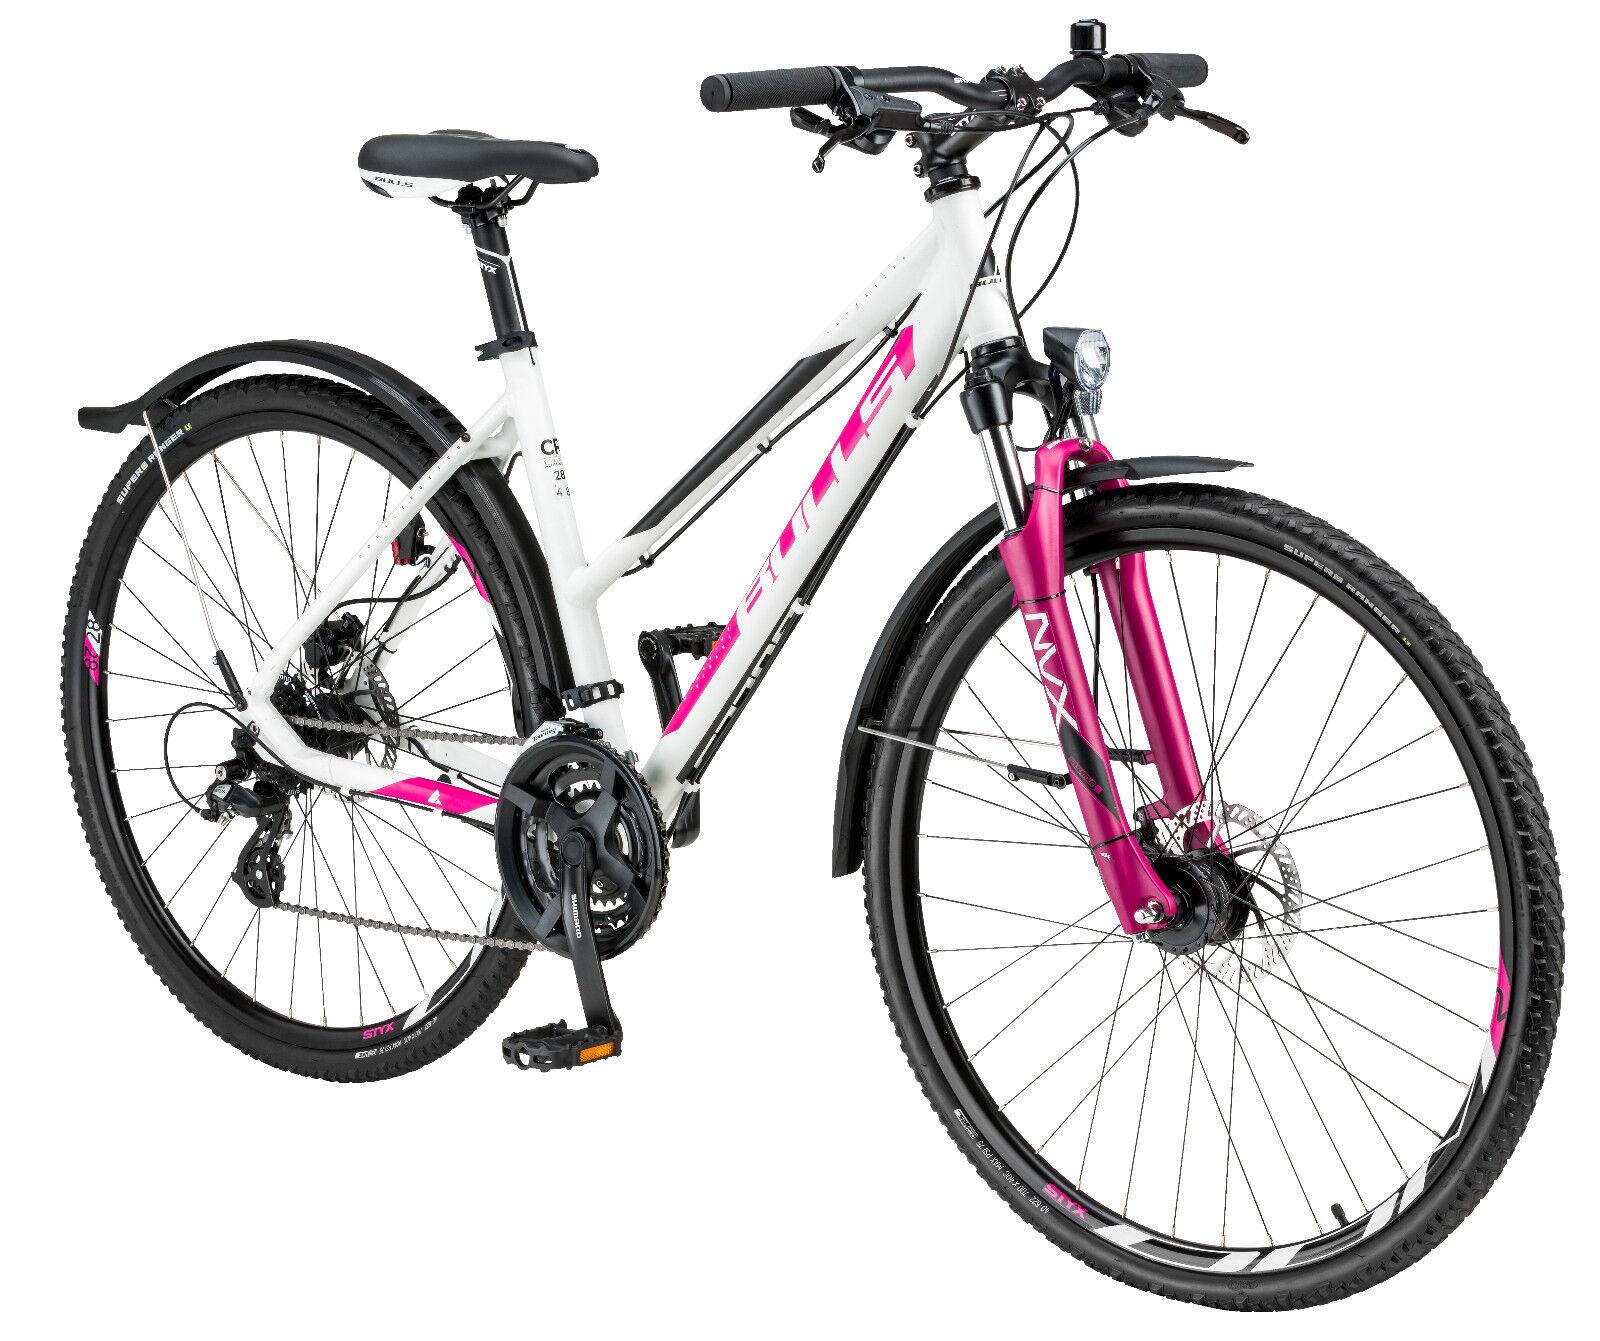 BULLS CROSSBIKE STREET Damen Shimano Crossrad Trekking Fahrrad Nabendynamo 48cm